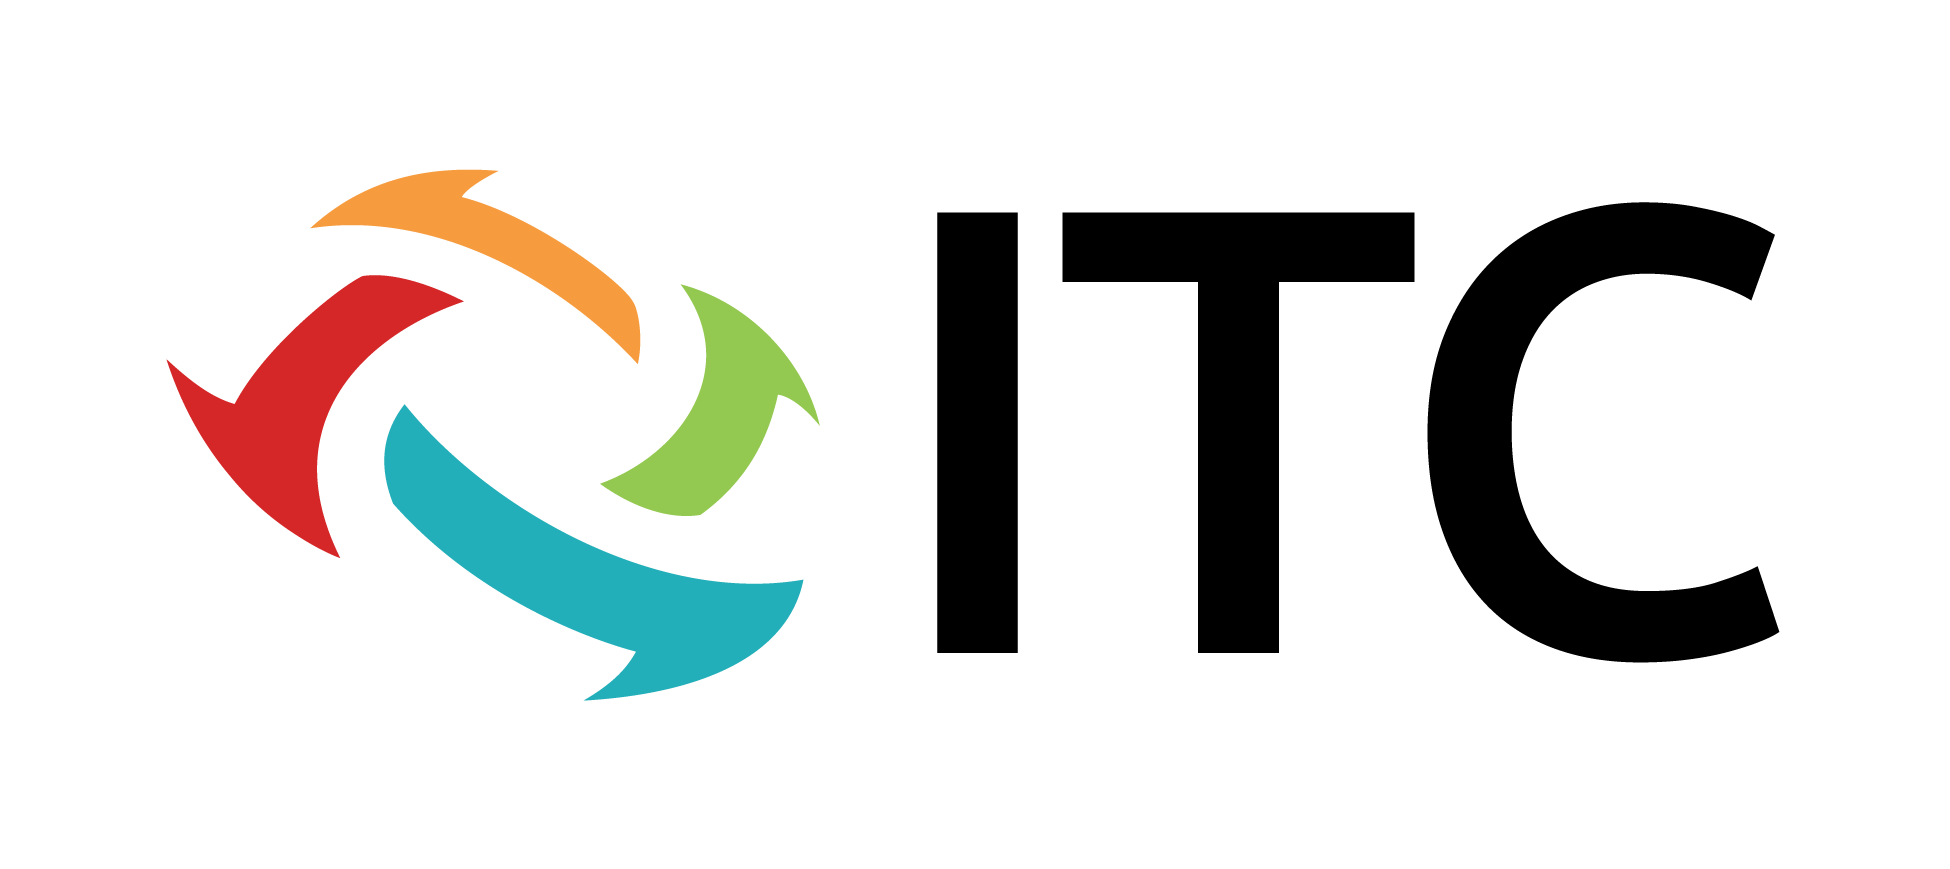 Agency Matrix logo